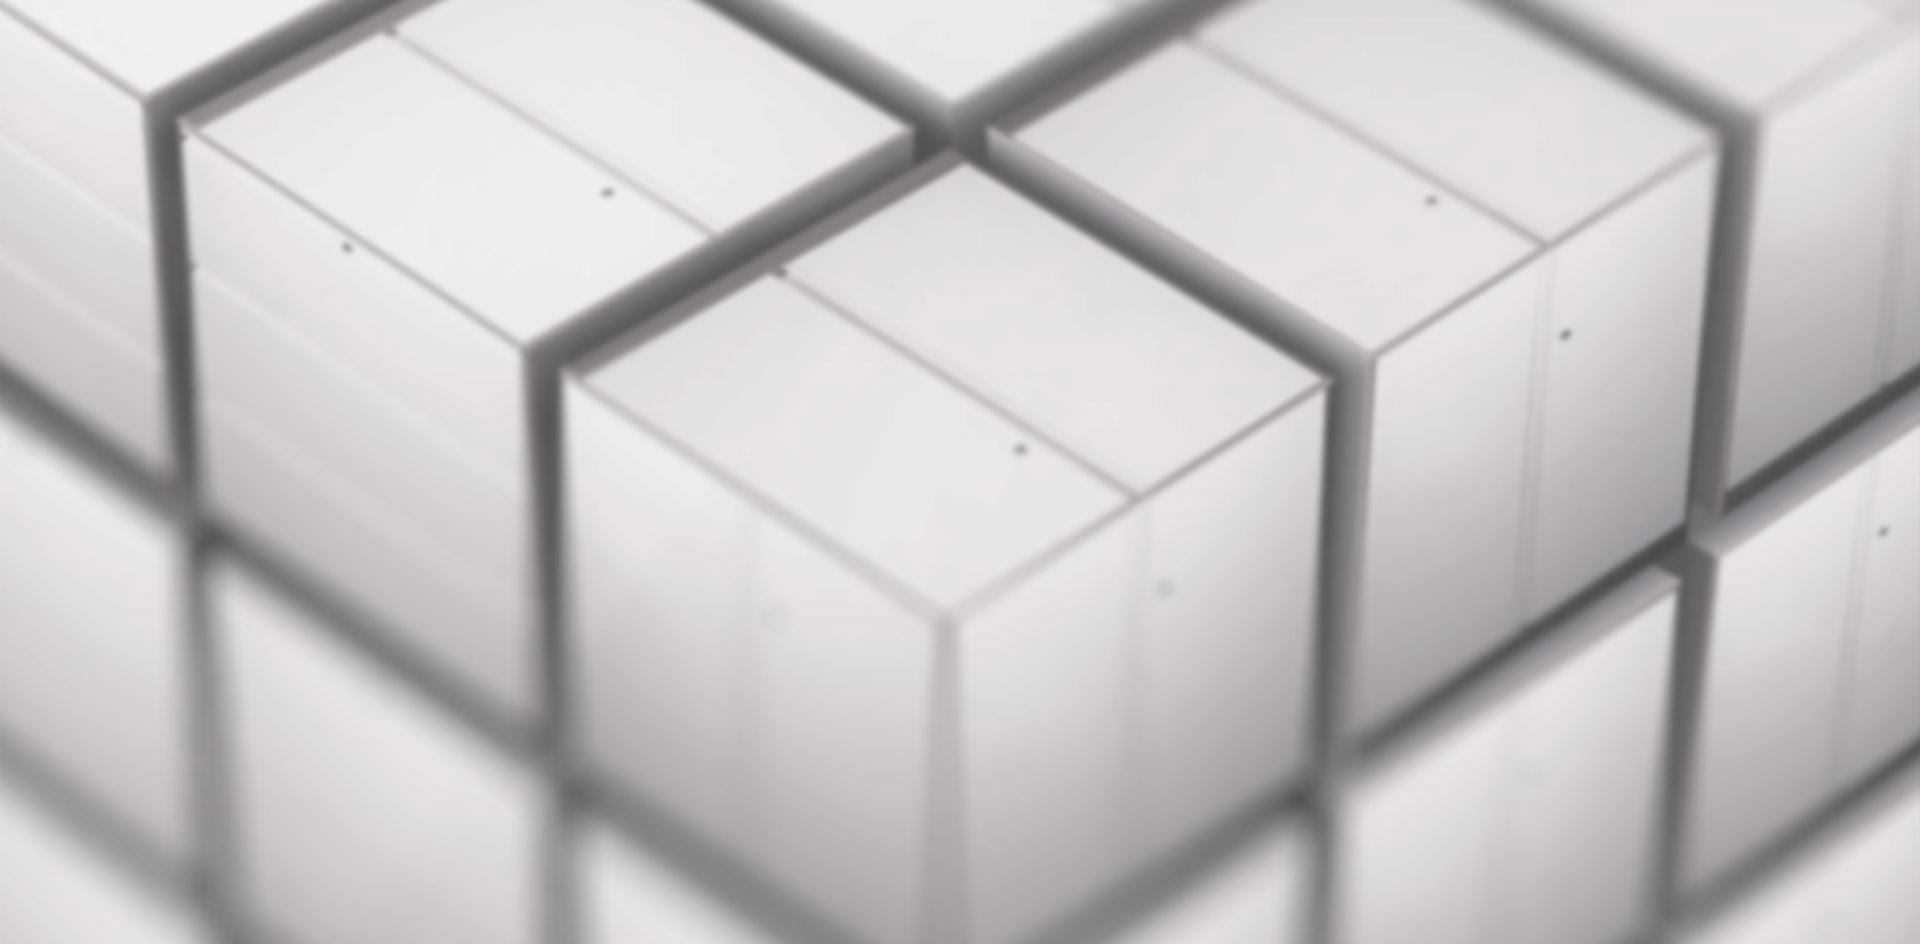 cube4u, graphic design portfolio, Black Rooster Studios, Midrand, Kyalam